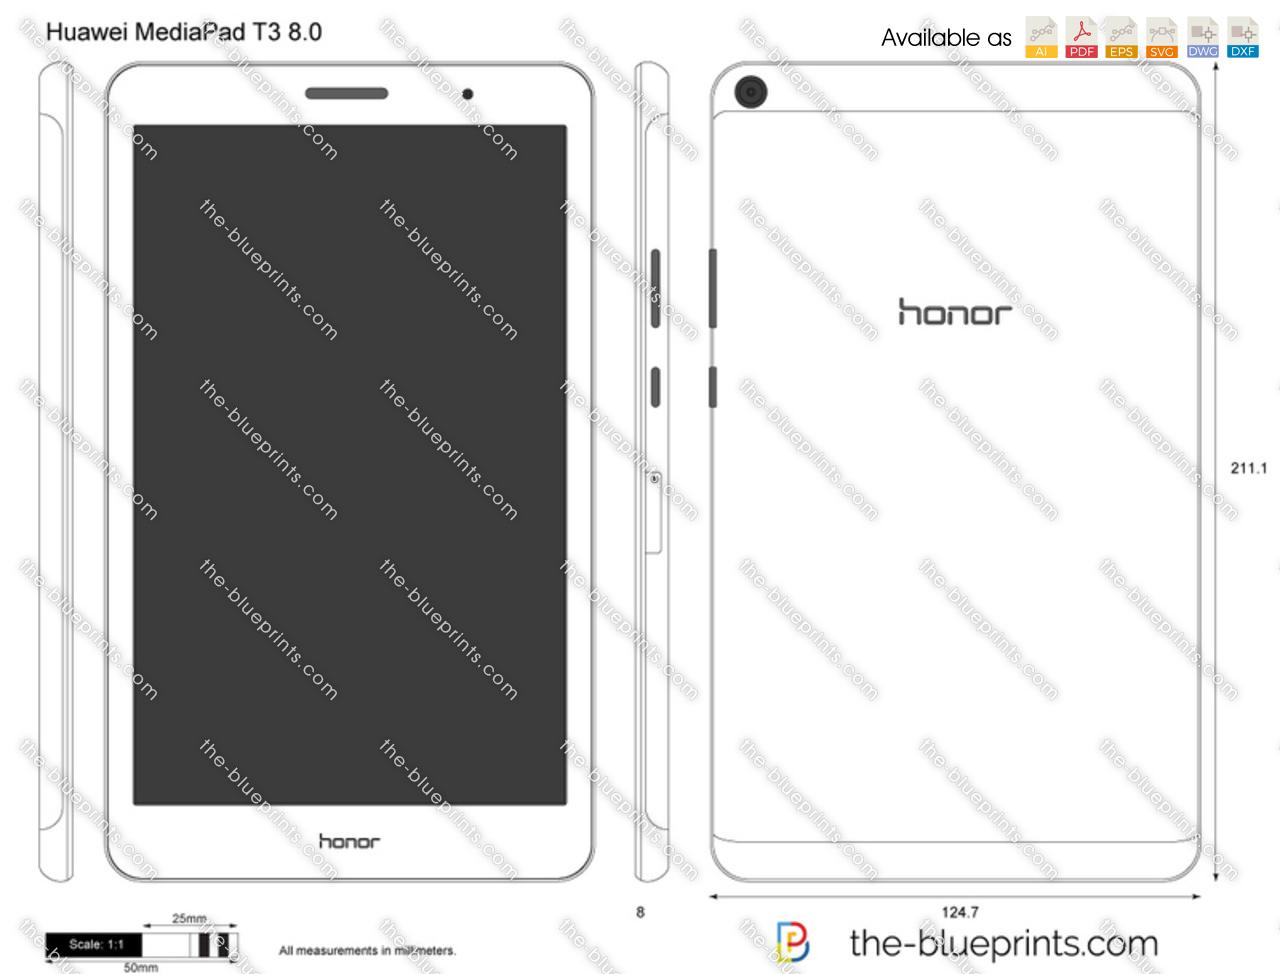 Huawei MediaPad T3 8.0